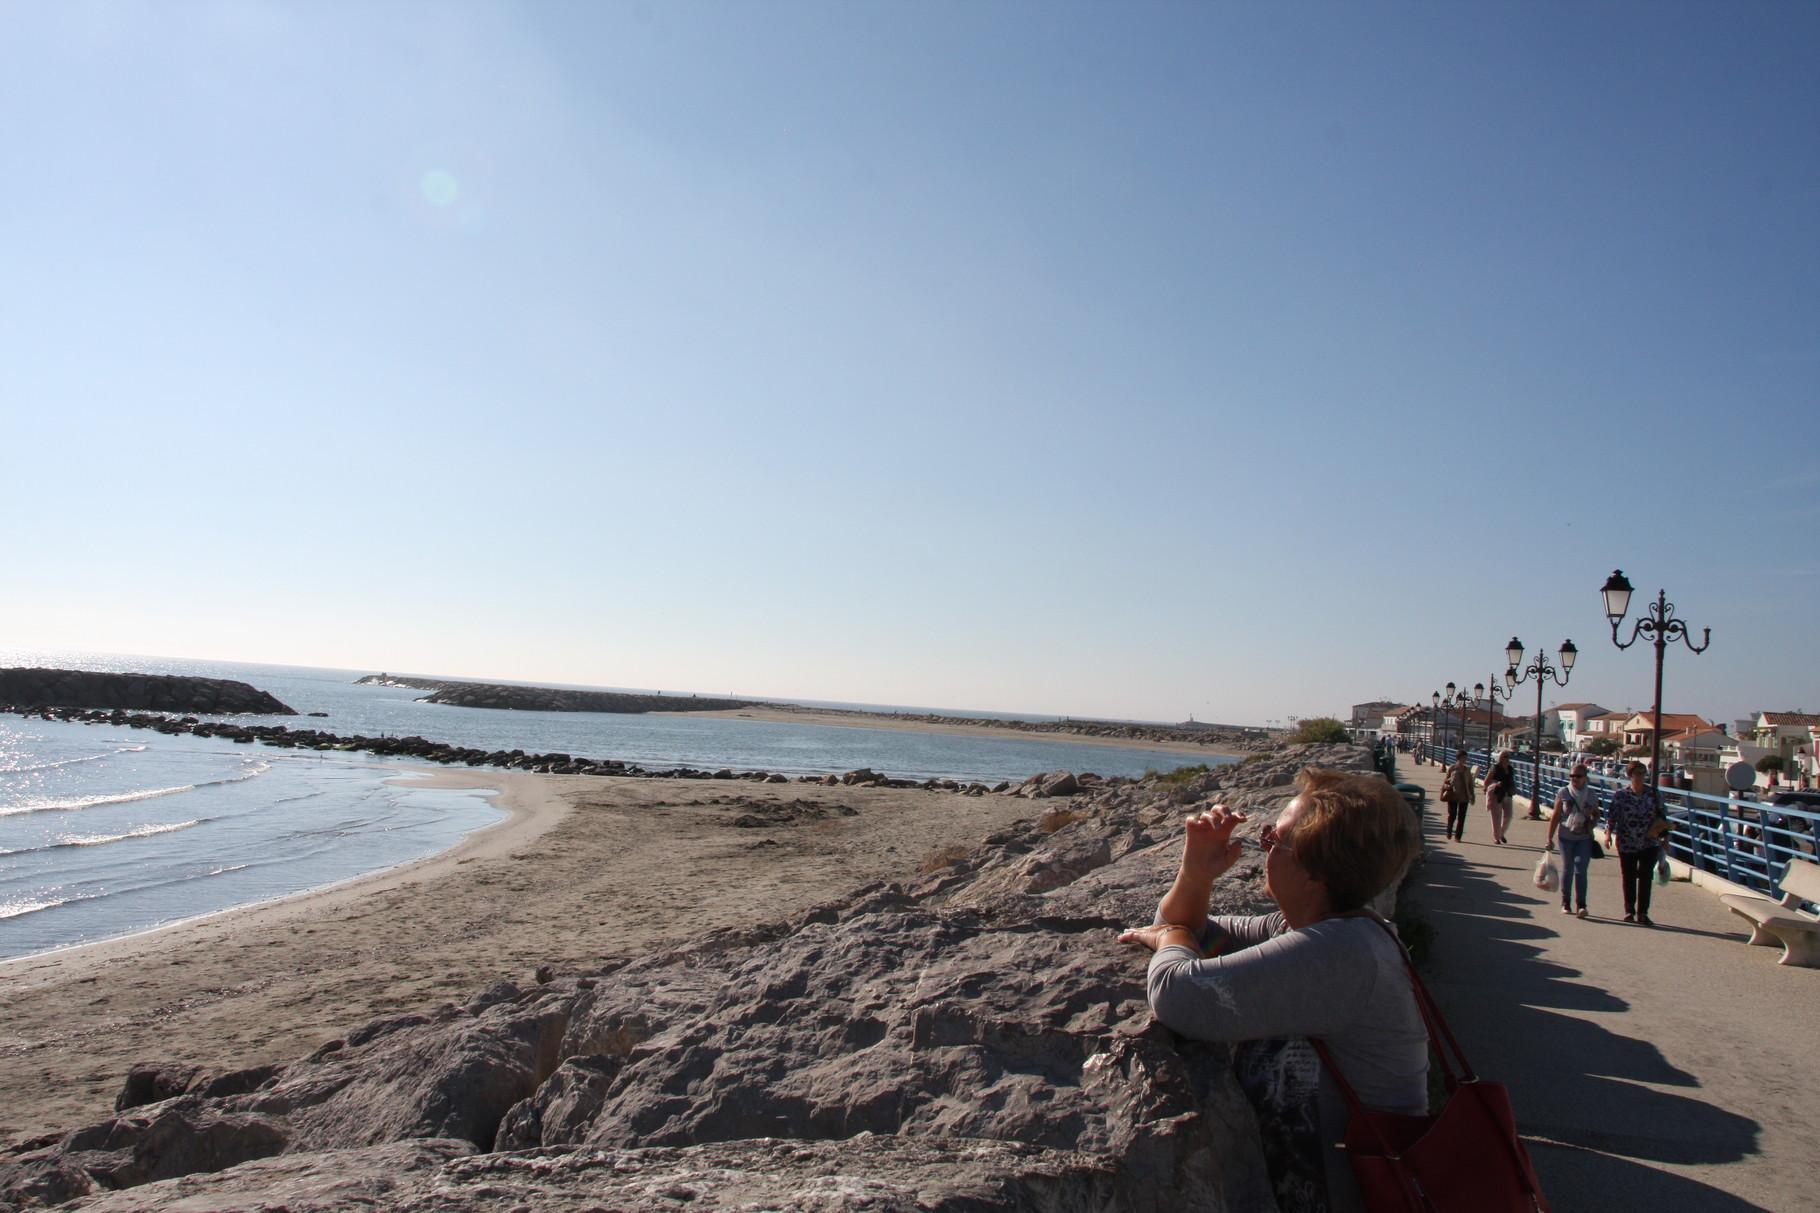 Bild: An der Strandpromenade in Saintes-Maries-de-la-Mer